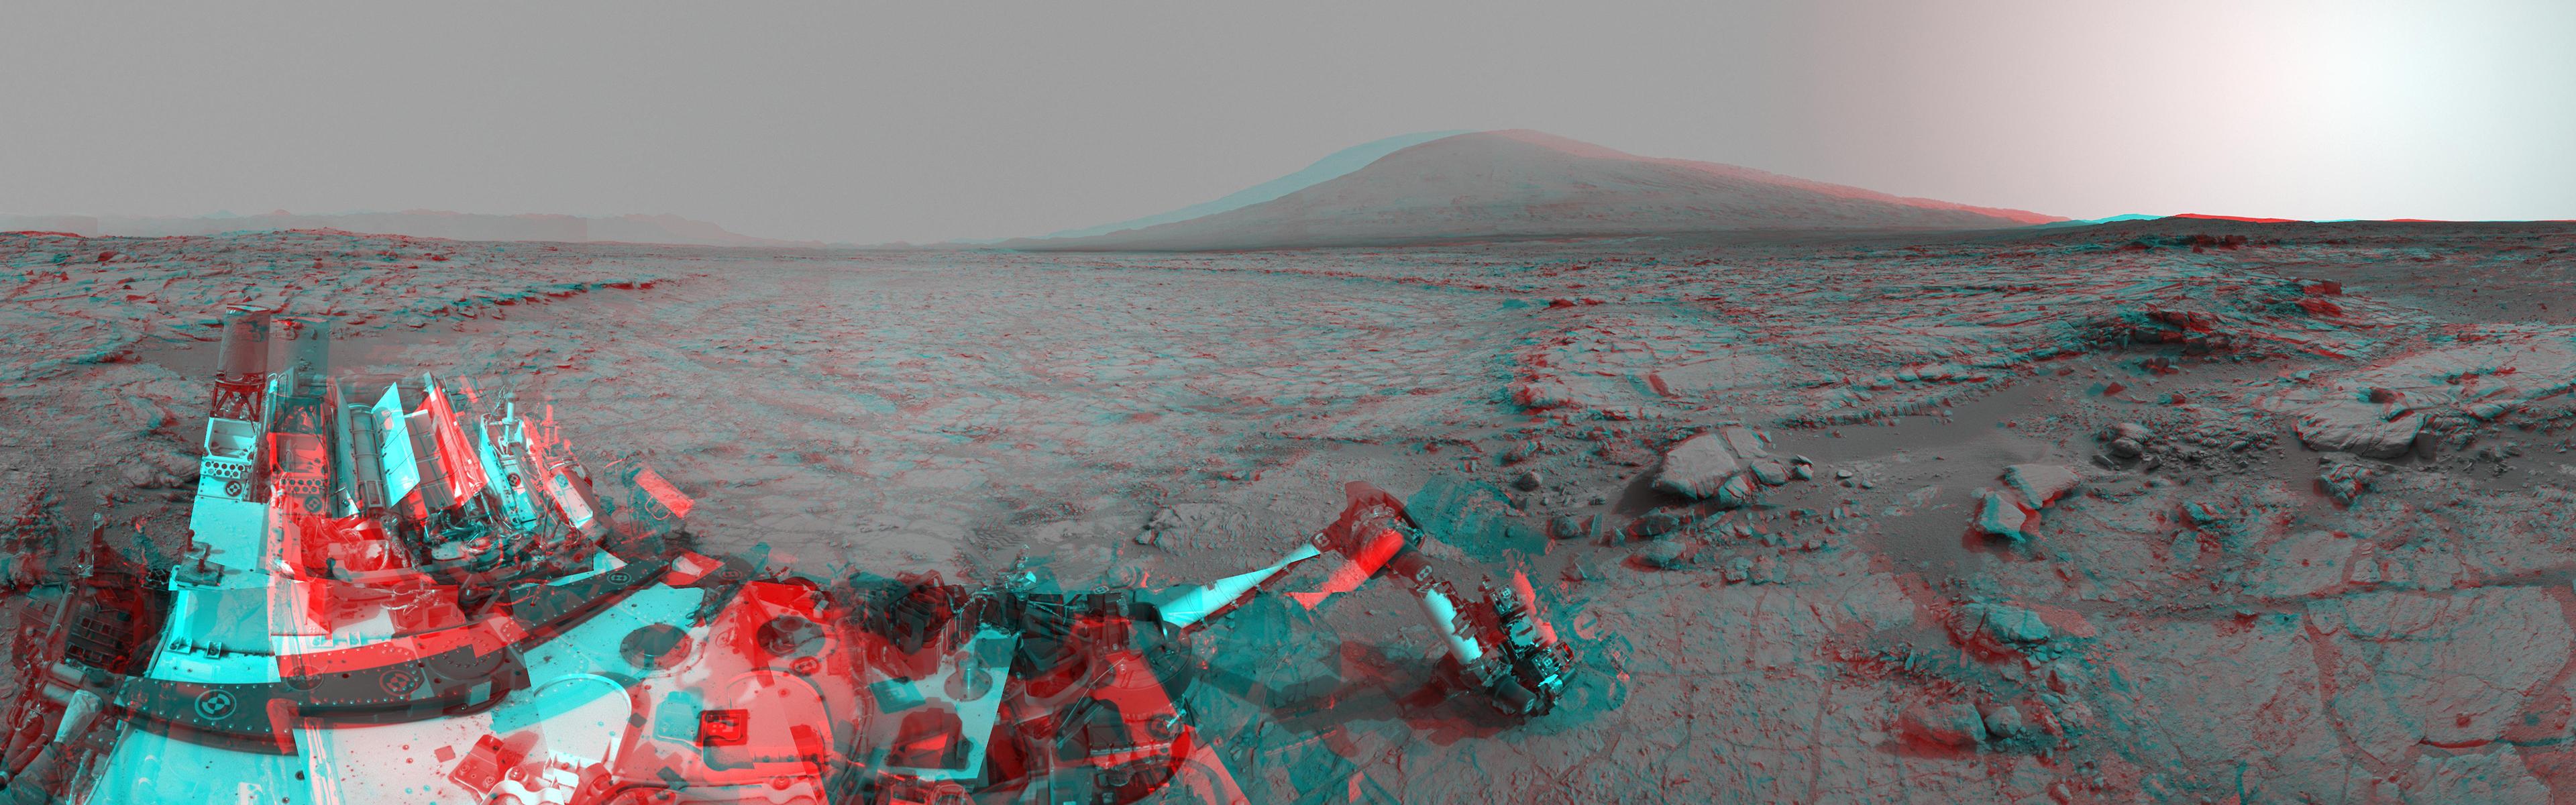 Curiosity Mars Rover Alien Landscape Machine NASA 3D multi dual 3840x1200